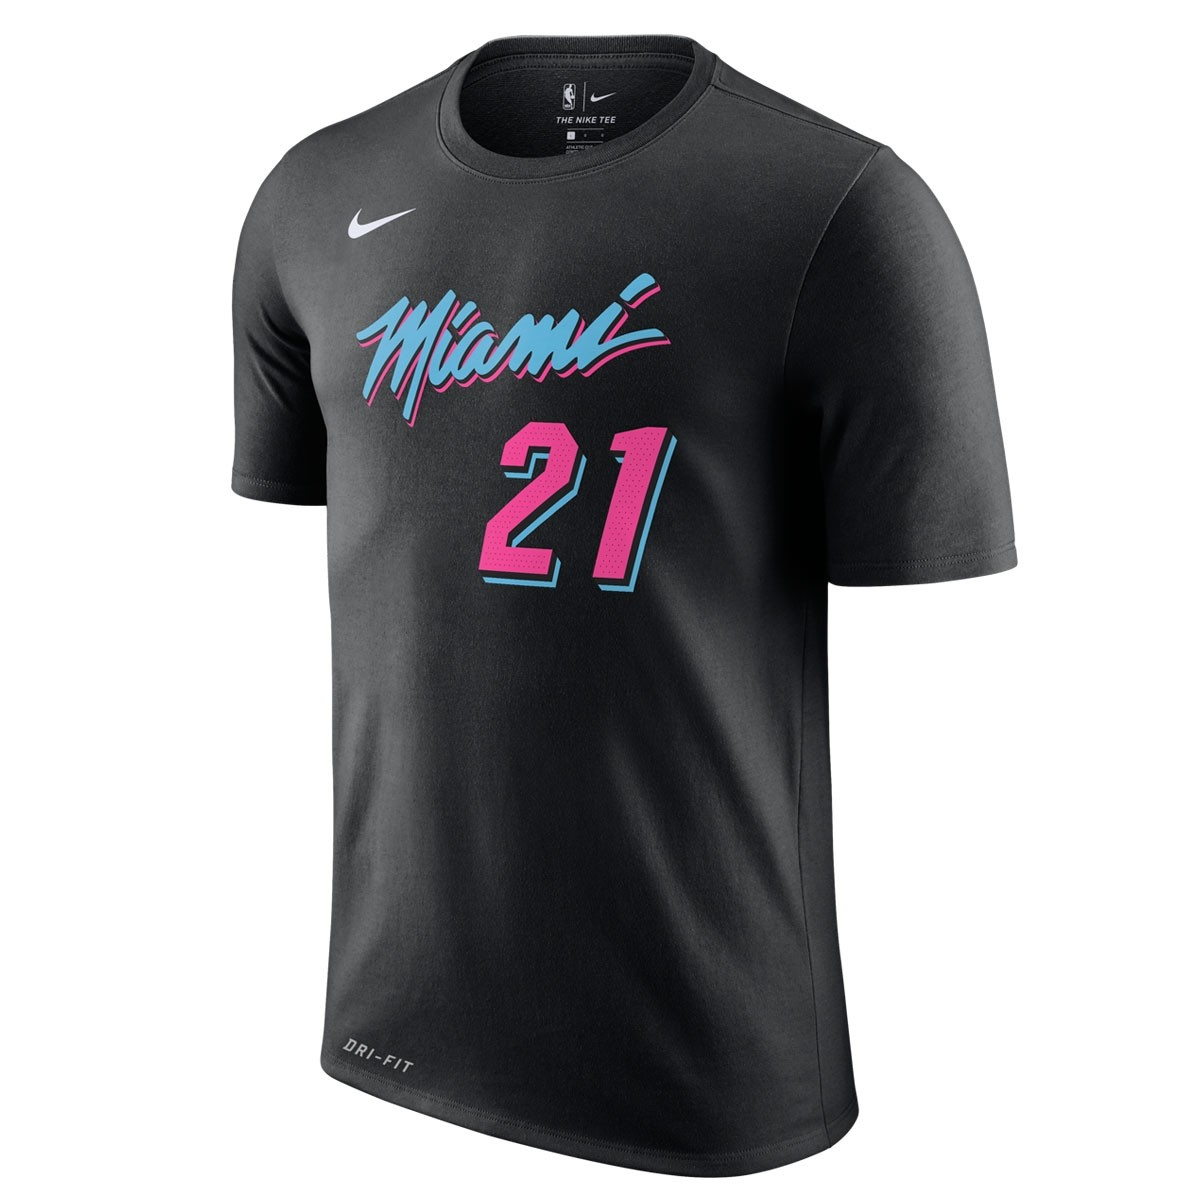 Nike NBA Miami Heat Nick Name Tee Whiteside 'City Edition'